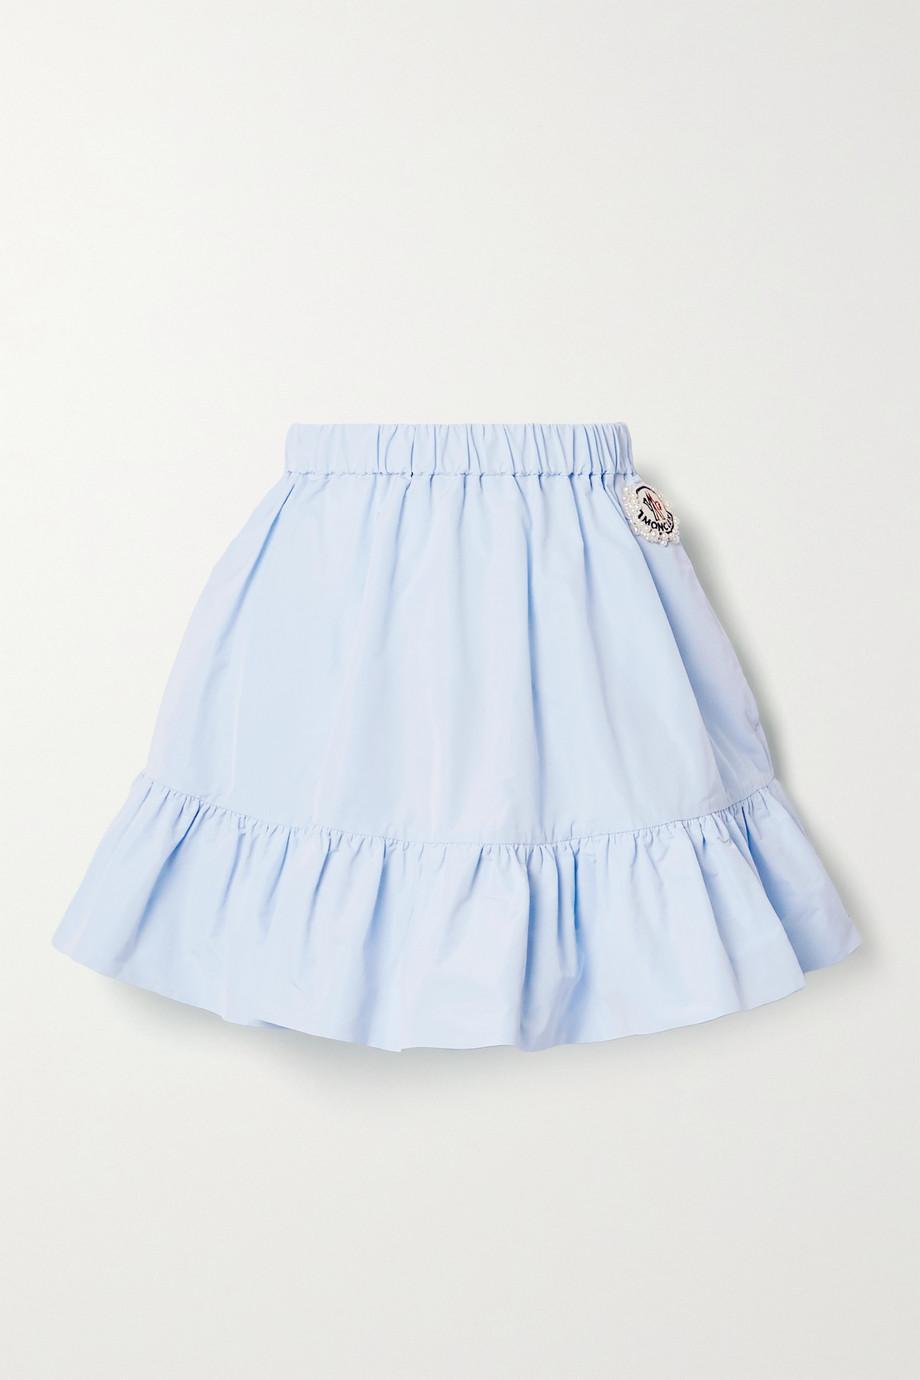 Moncler Genius + 4 Simone Rocha ruffled shell mini skirt